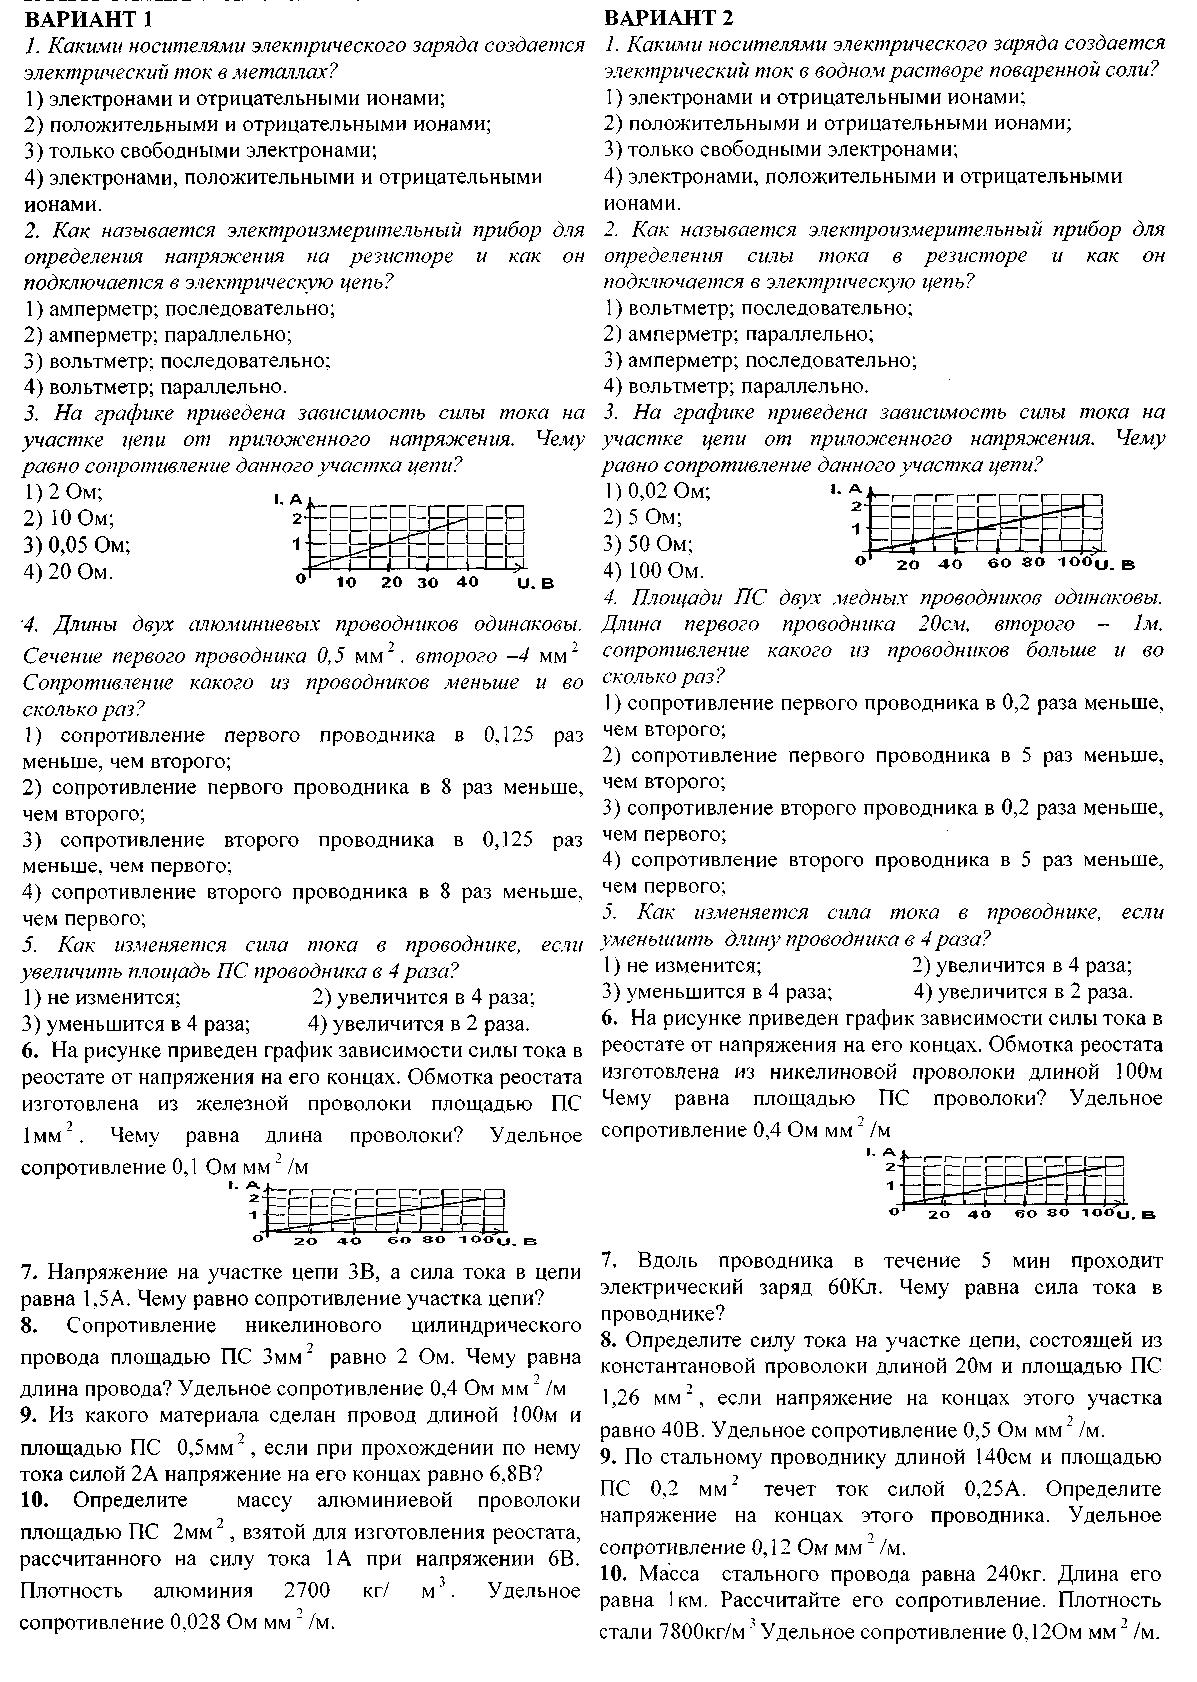 Лабораторная работа по физике 8 класс шахмаев